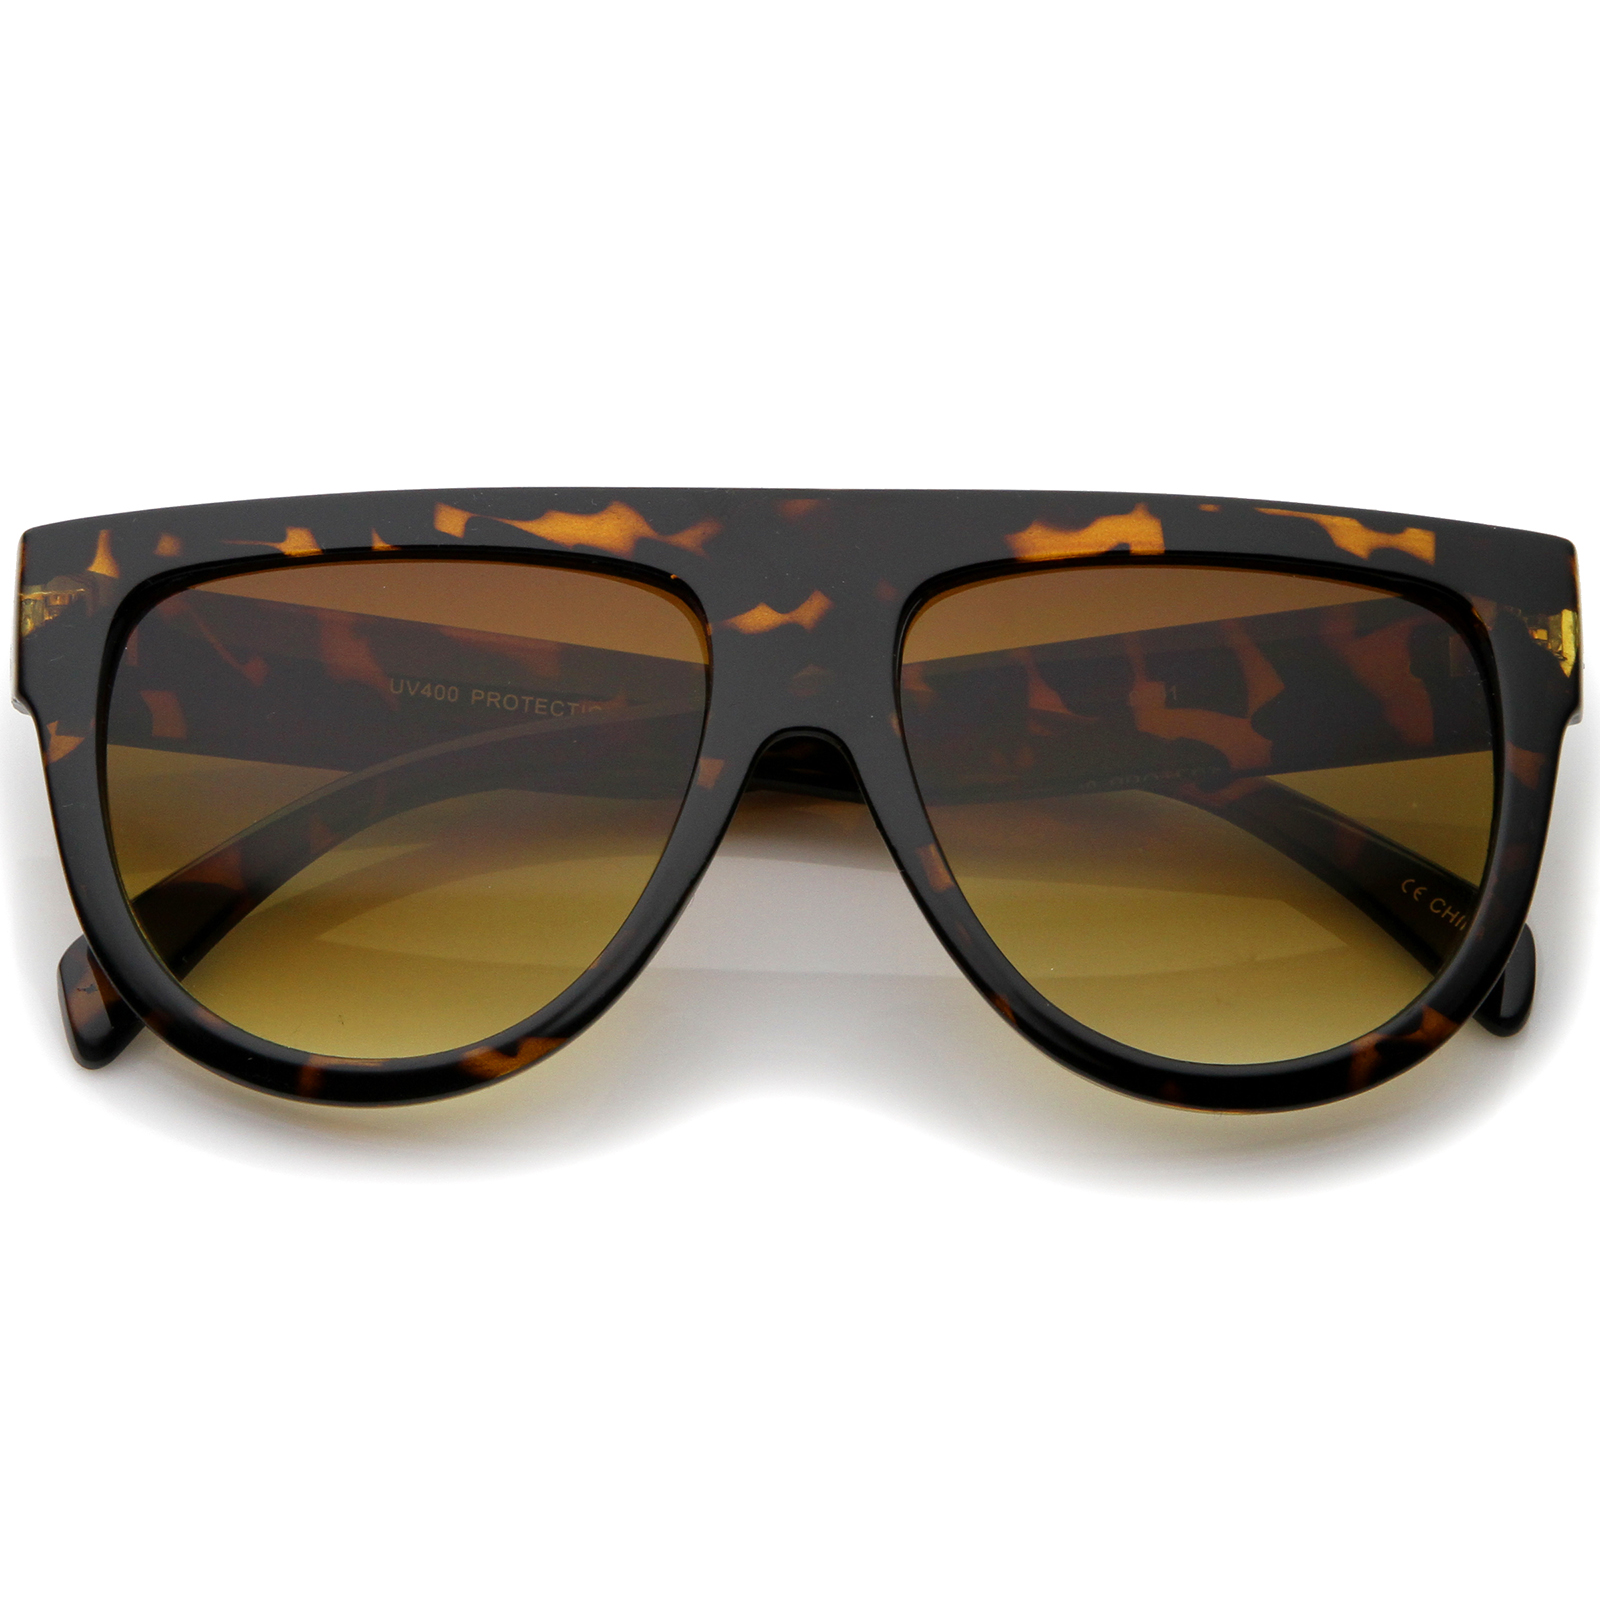 Large Oversize Wide Temple Flat Top Aviator Sunglasses 57mm (Orange-Tortoise / Amber)